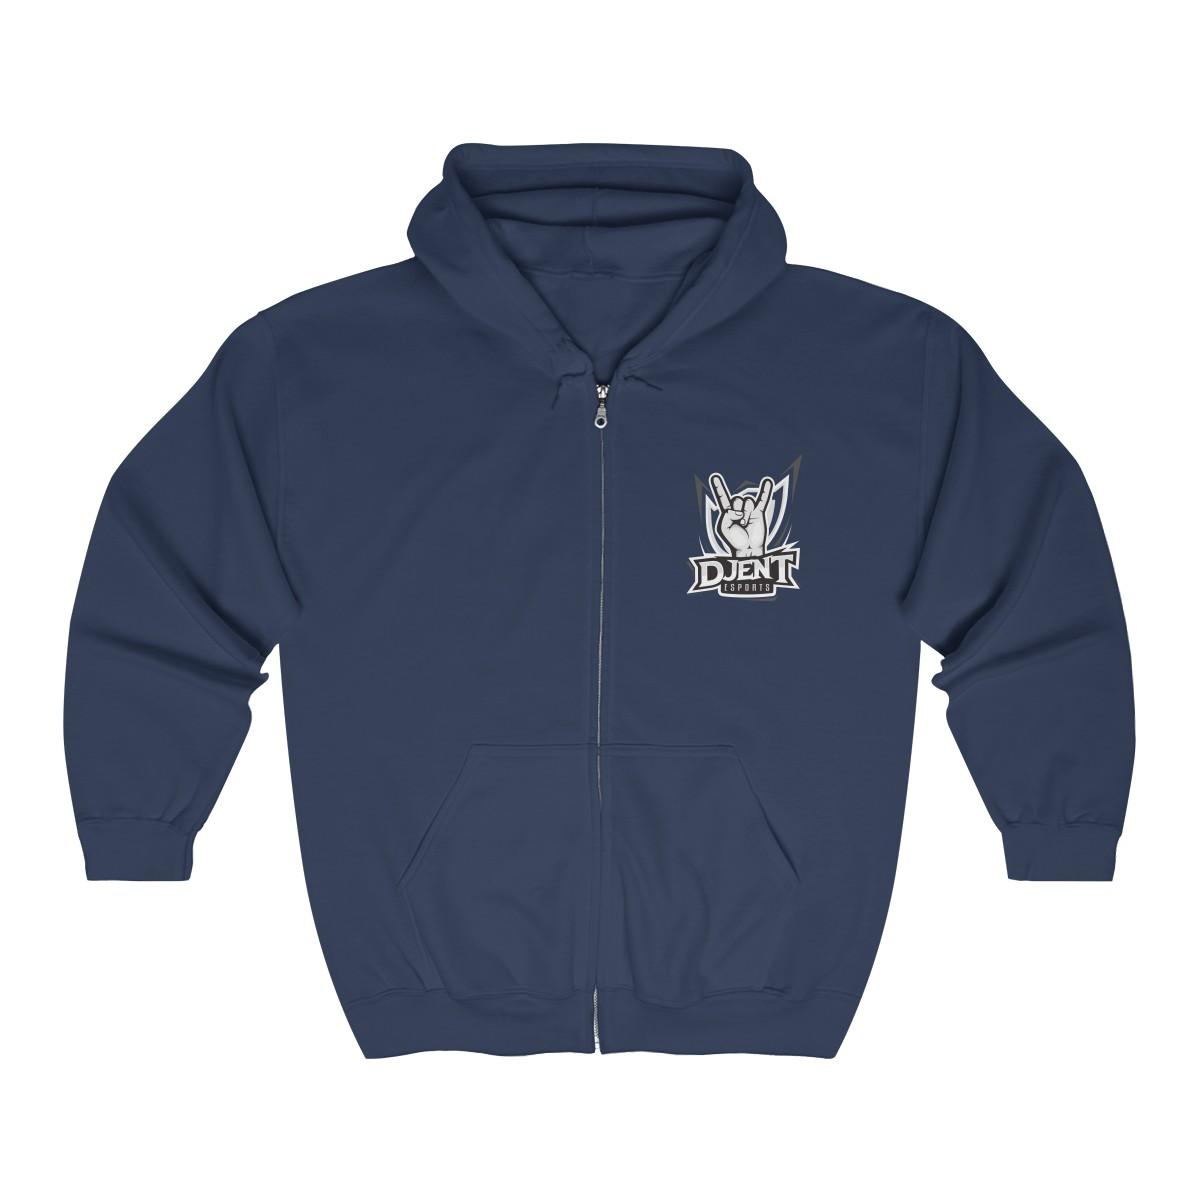 Djent Esports Full Zip Hooded Sweatshirt - Black Logo